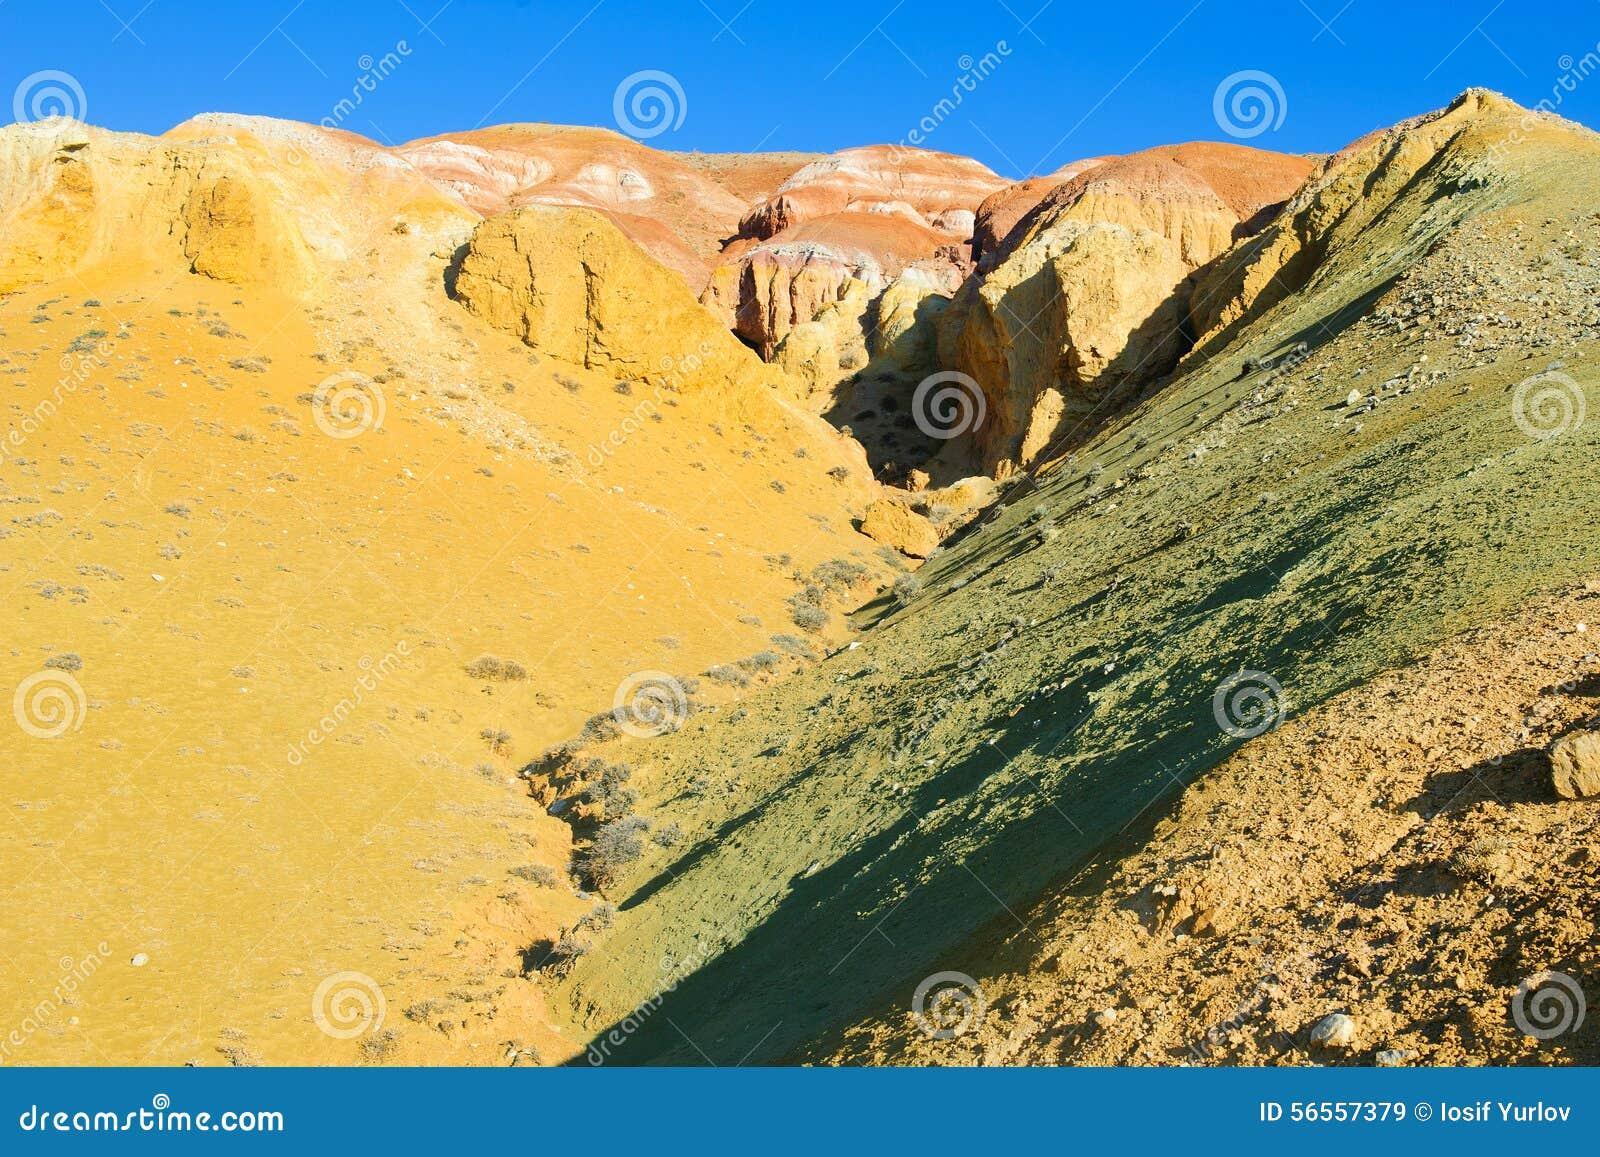 Download Χώμα χρώματος των καταθέσεων υδραργύρου σε Altai Στοκ Εικόνα - εικόνα από κανένας, κενός: 56557379